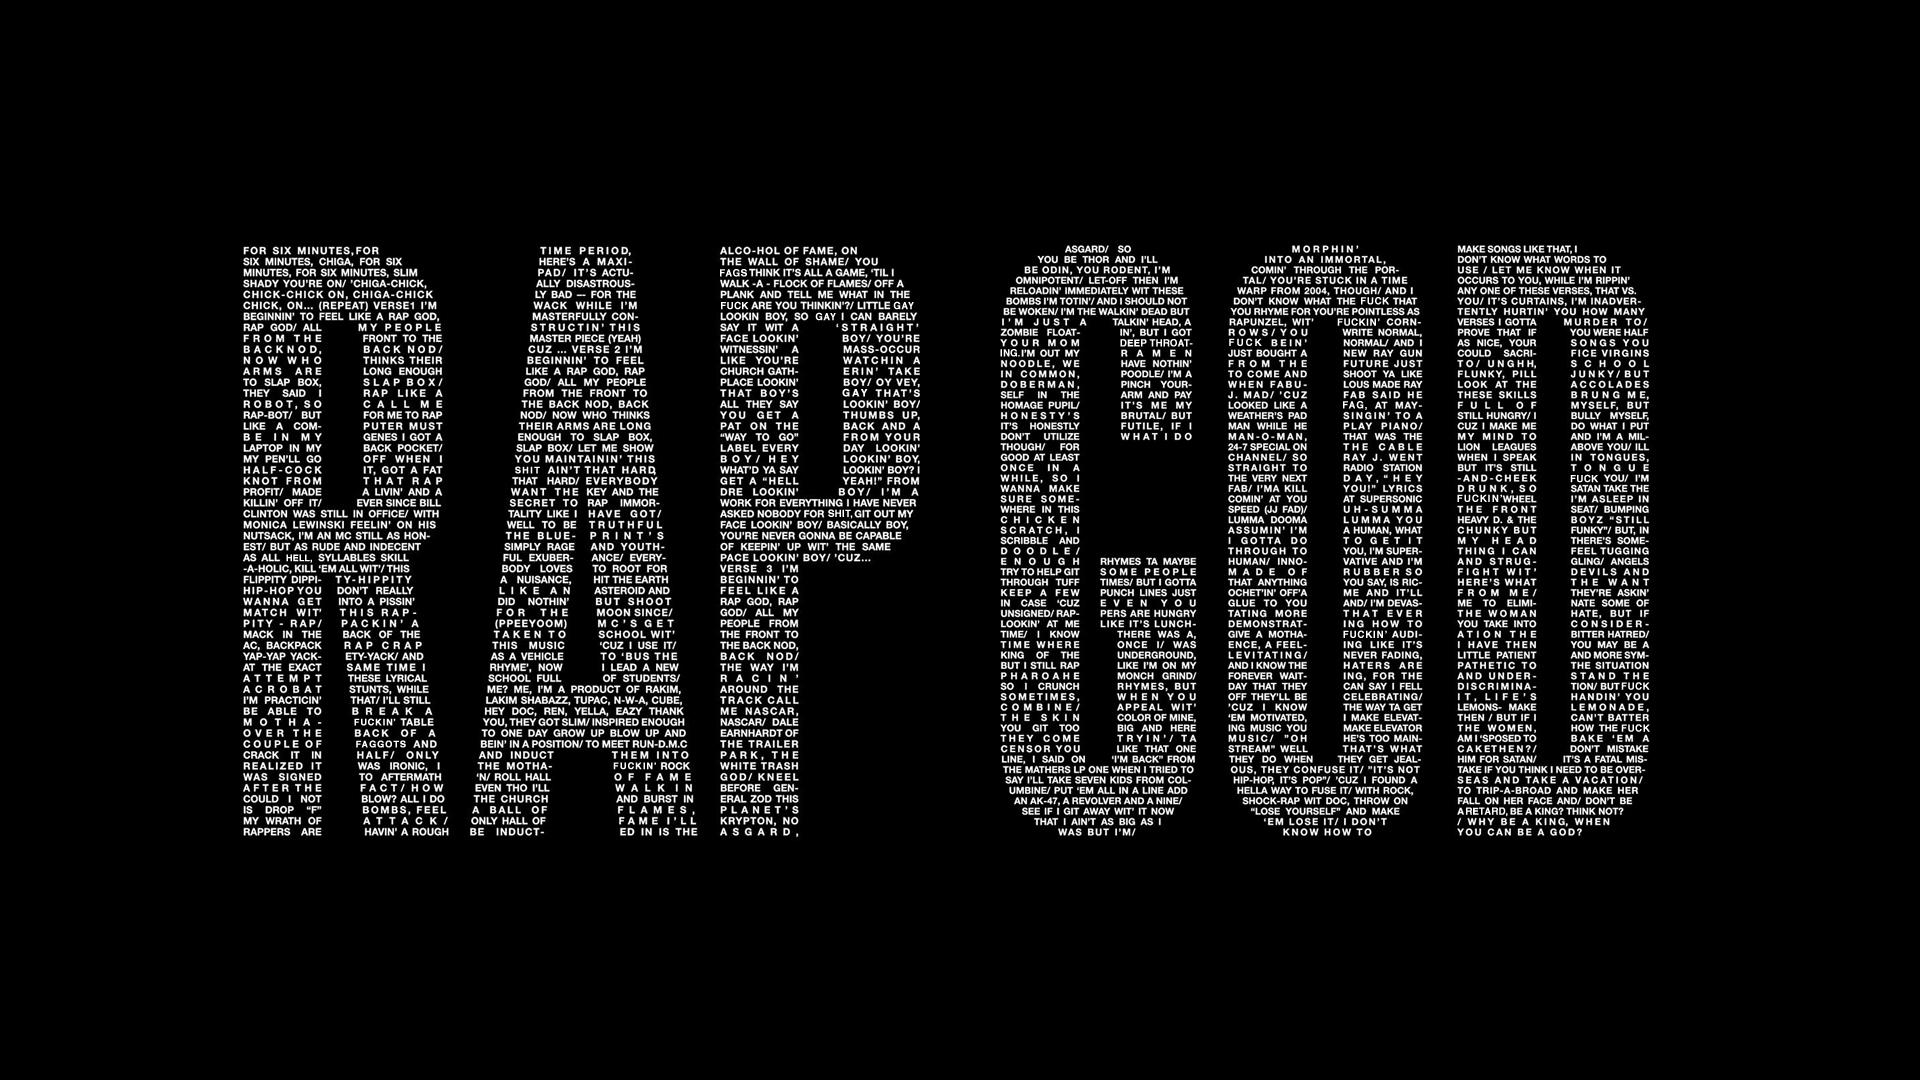 rap god wallpaper black by edgarsvensson customization wallpaper other 1920x1080